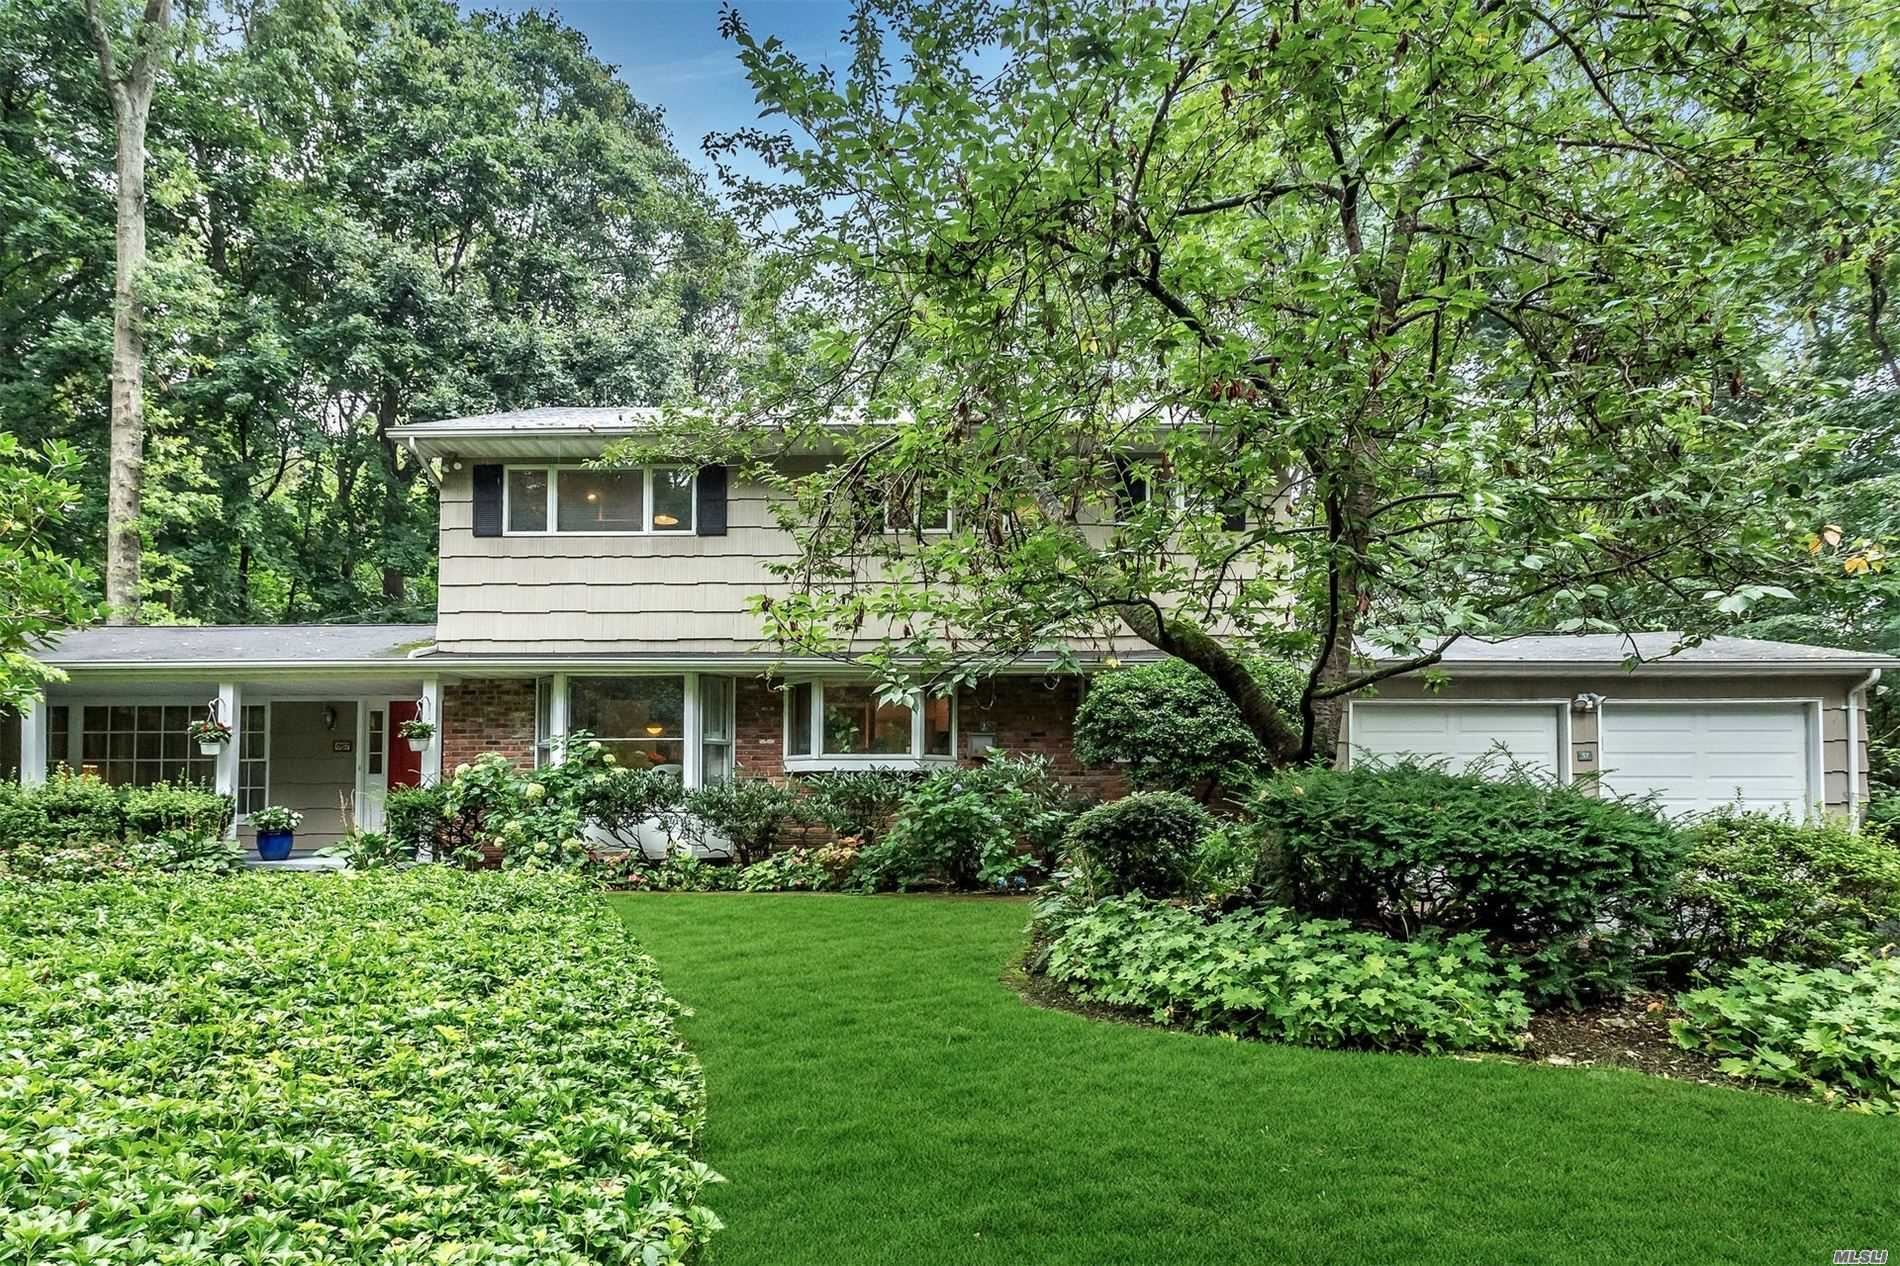 57 Briarfield Lane, Huntington, NY 11743 - MLS#: 3241078